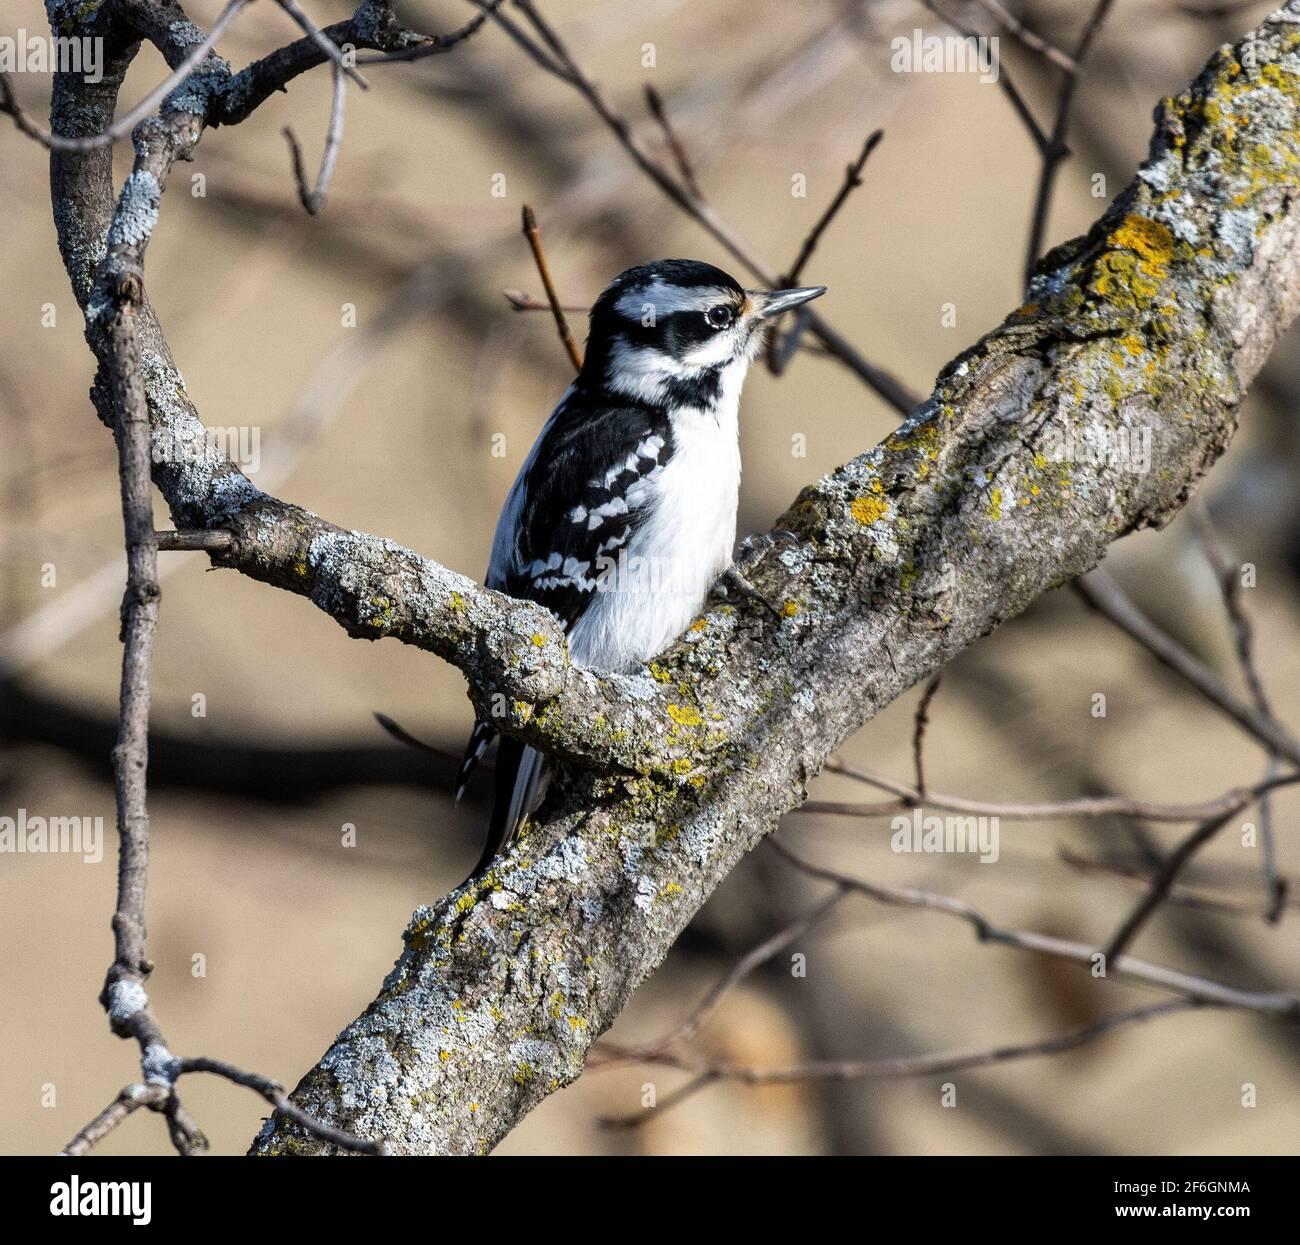 female-downy-woodpecker-on-tree-branch-2F6GNMA.jpg